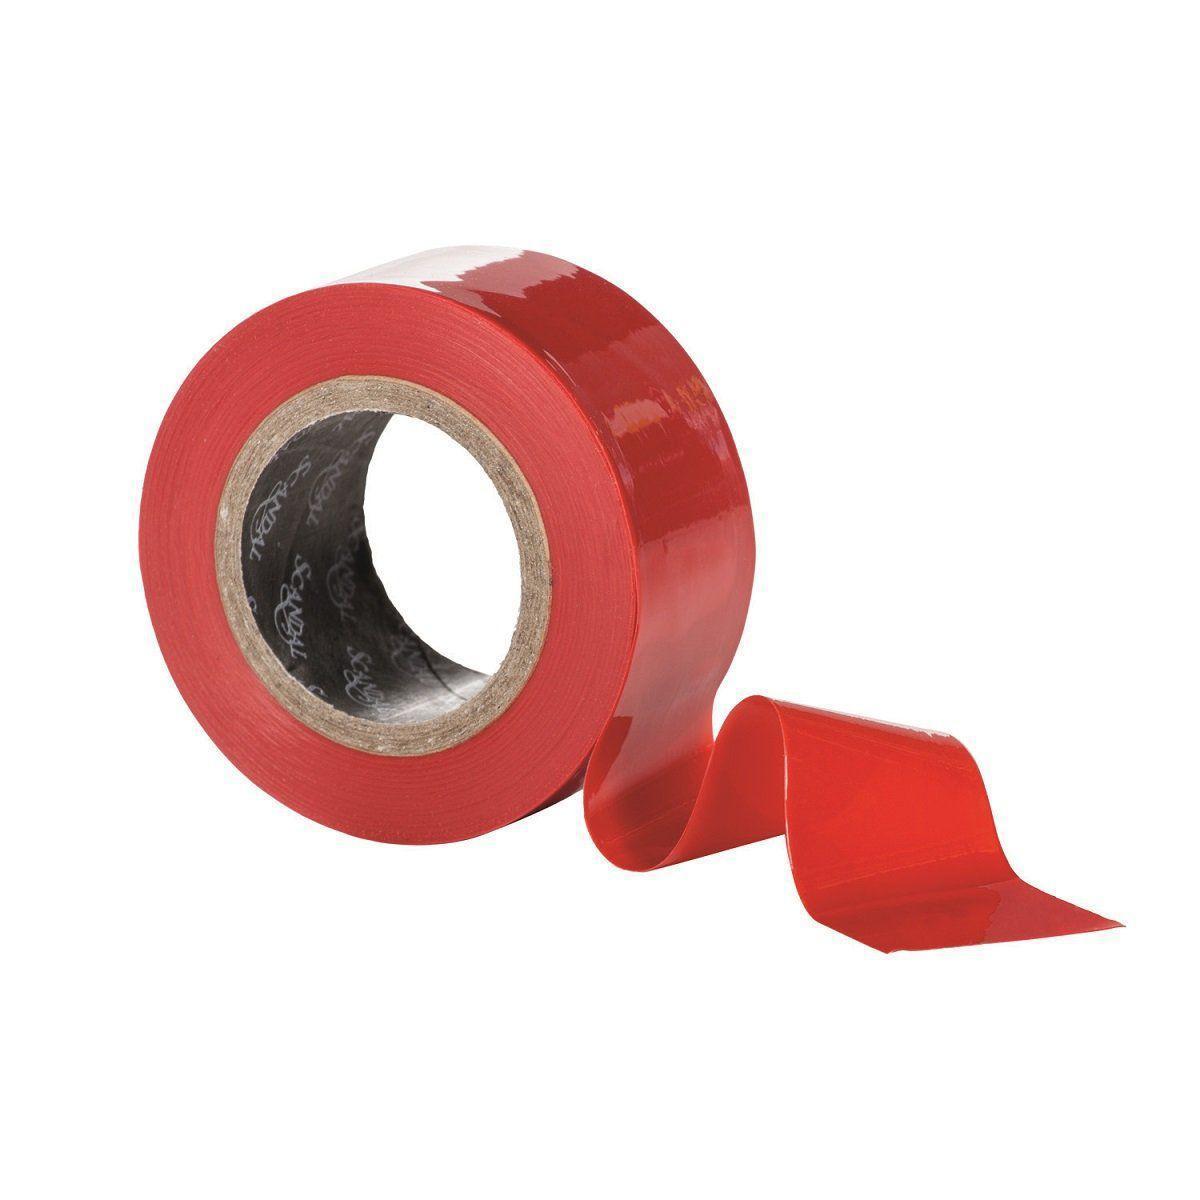 Красный скотч для связывания Scandal Lovers Tape-9922